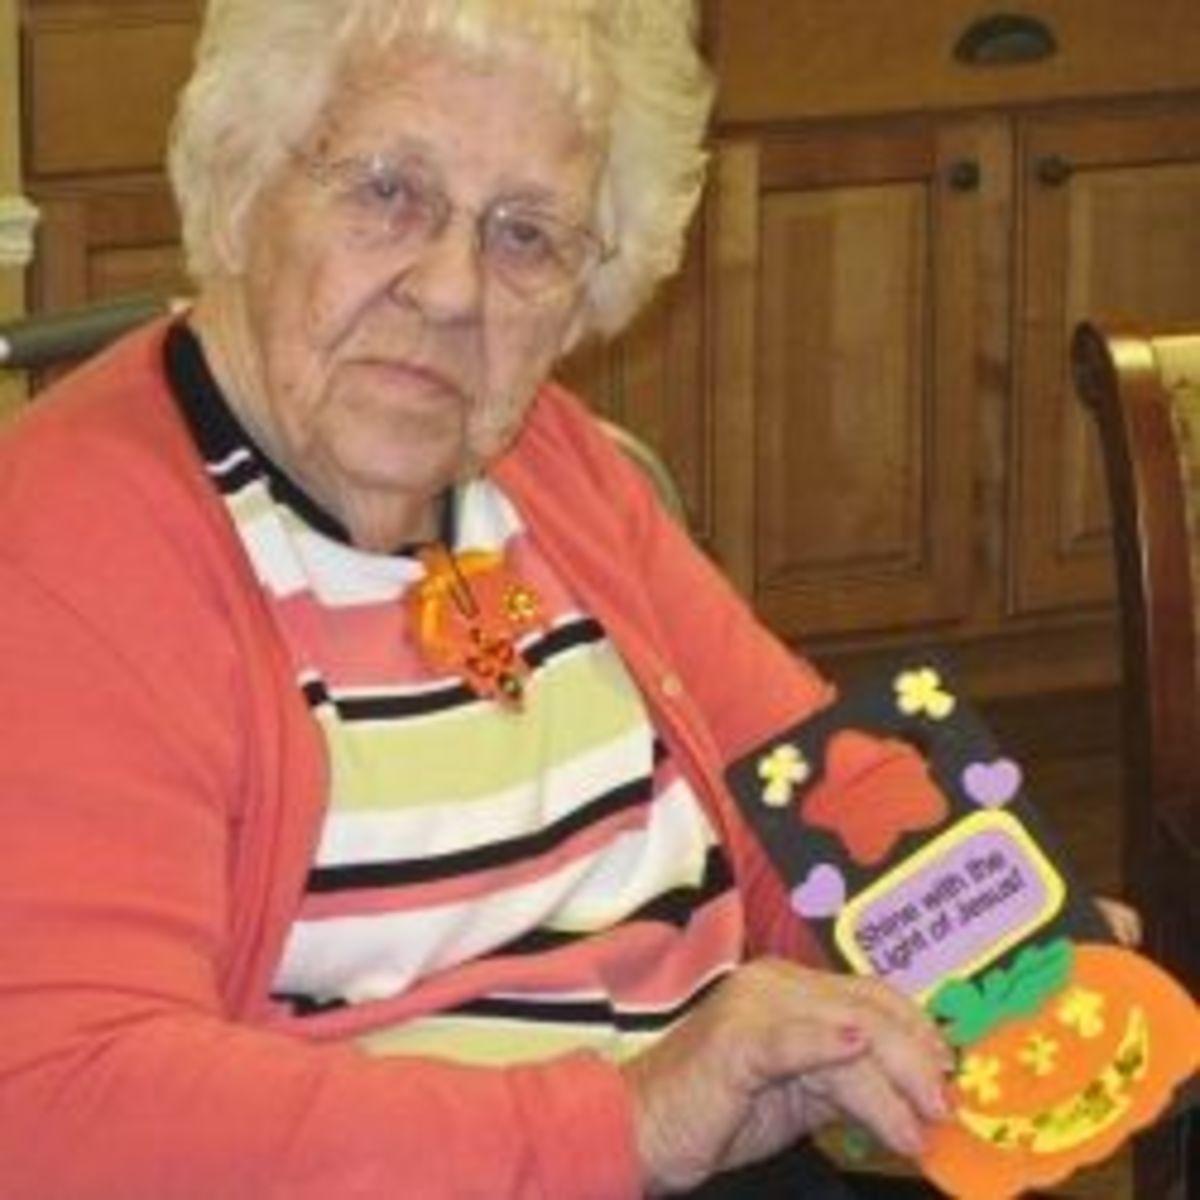 Halloween Crafts for the Elderly